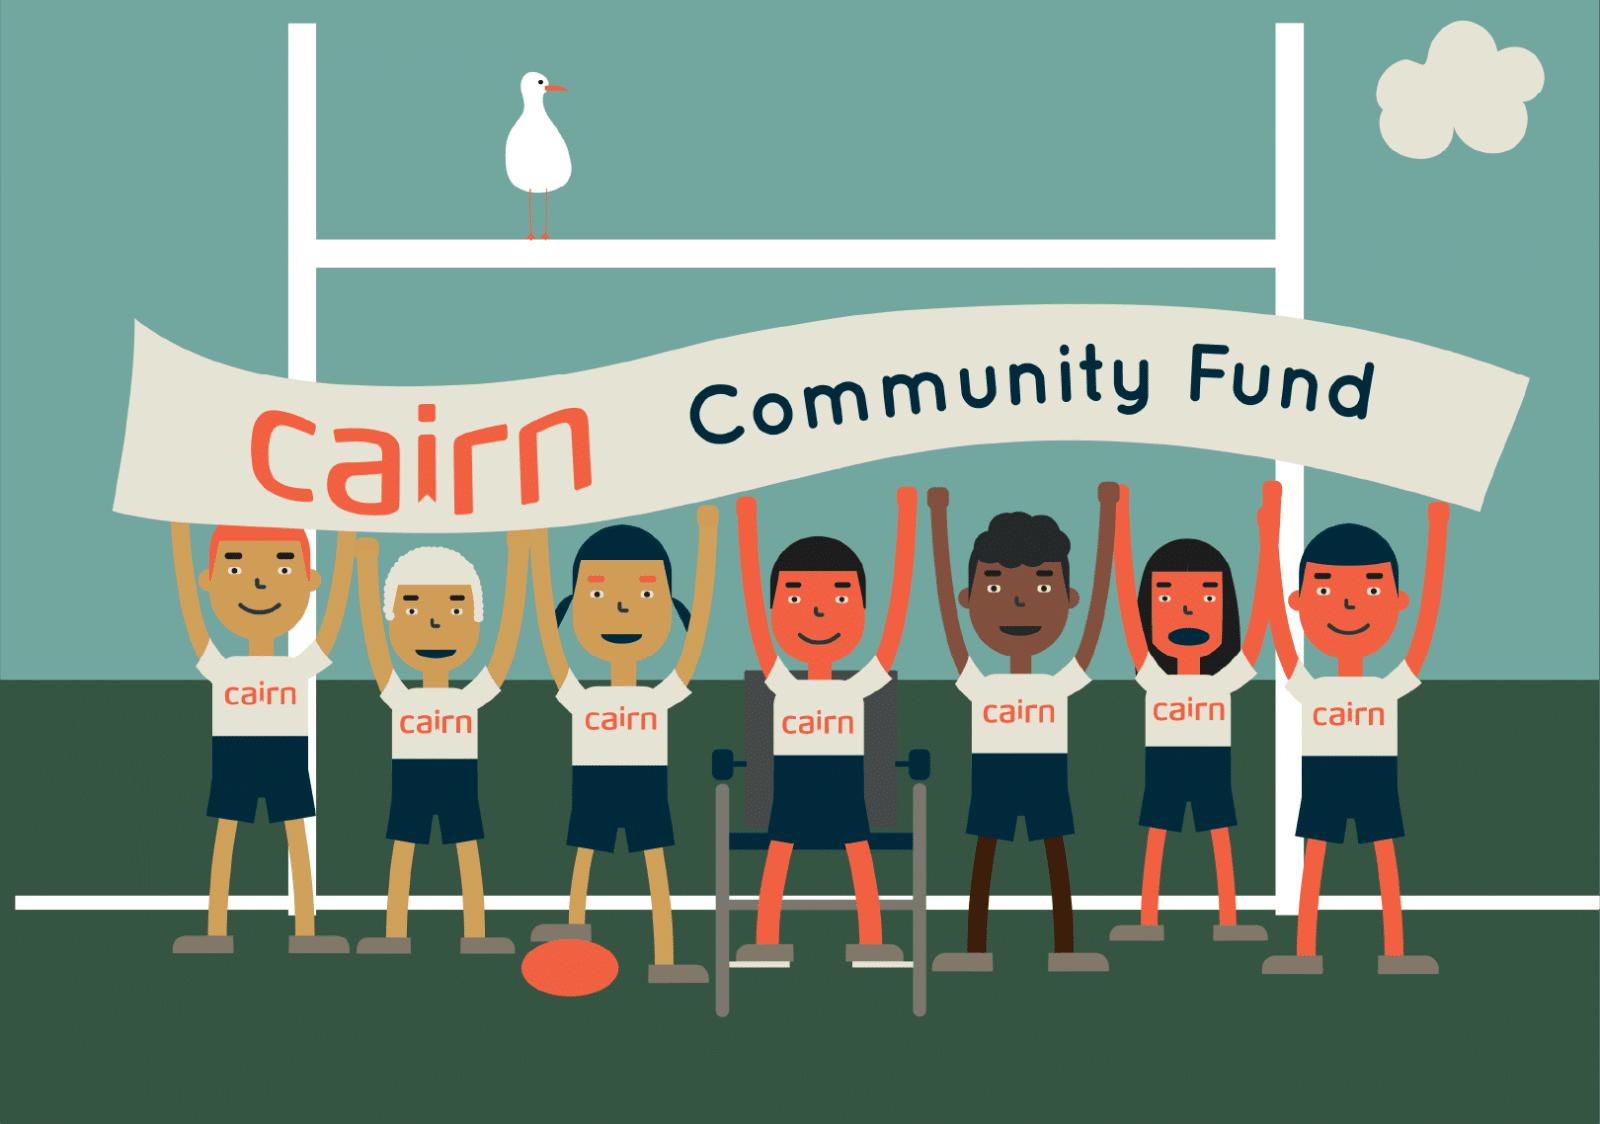 Cairn community fund